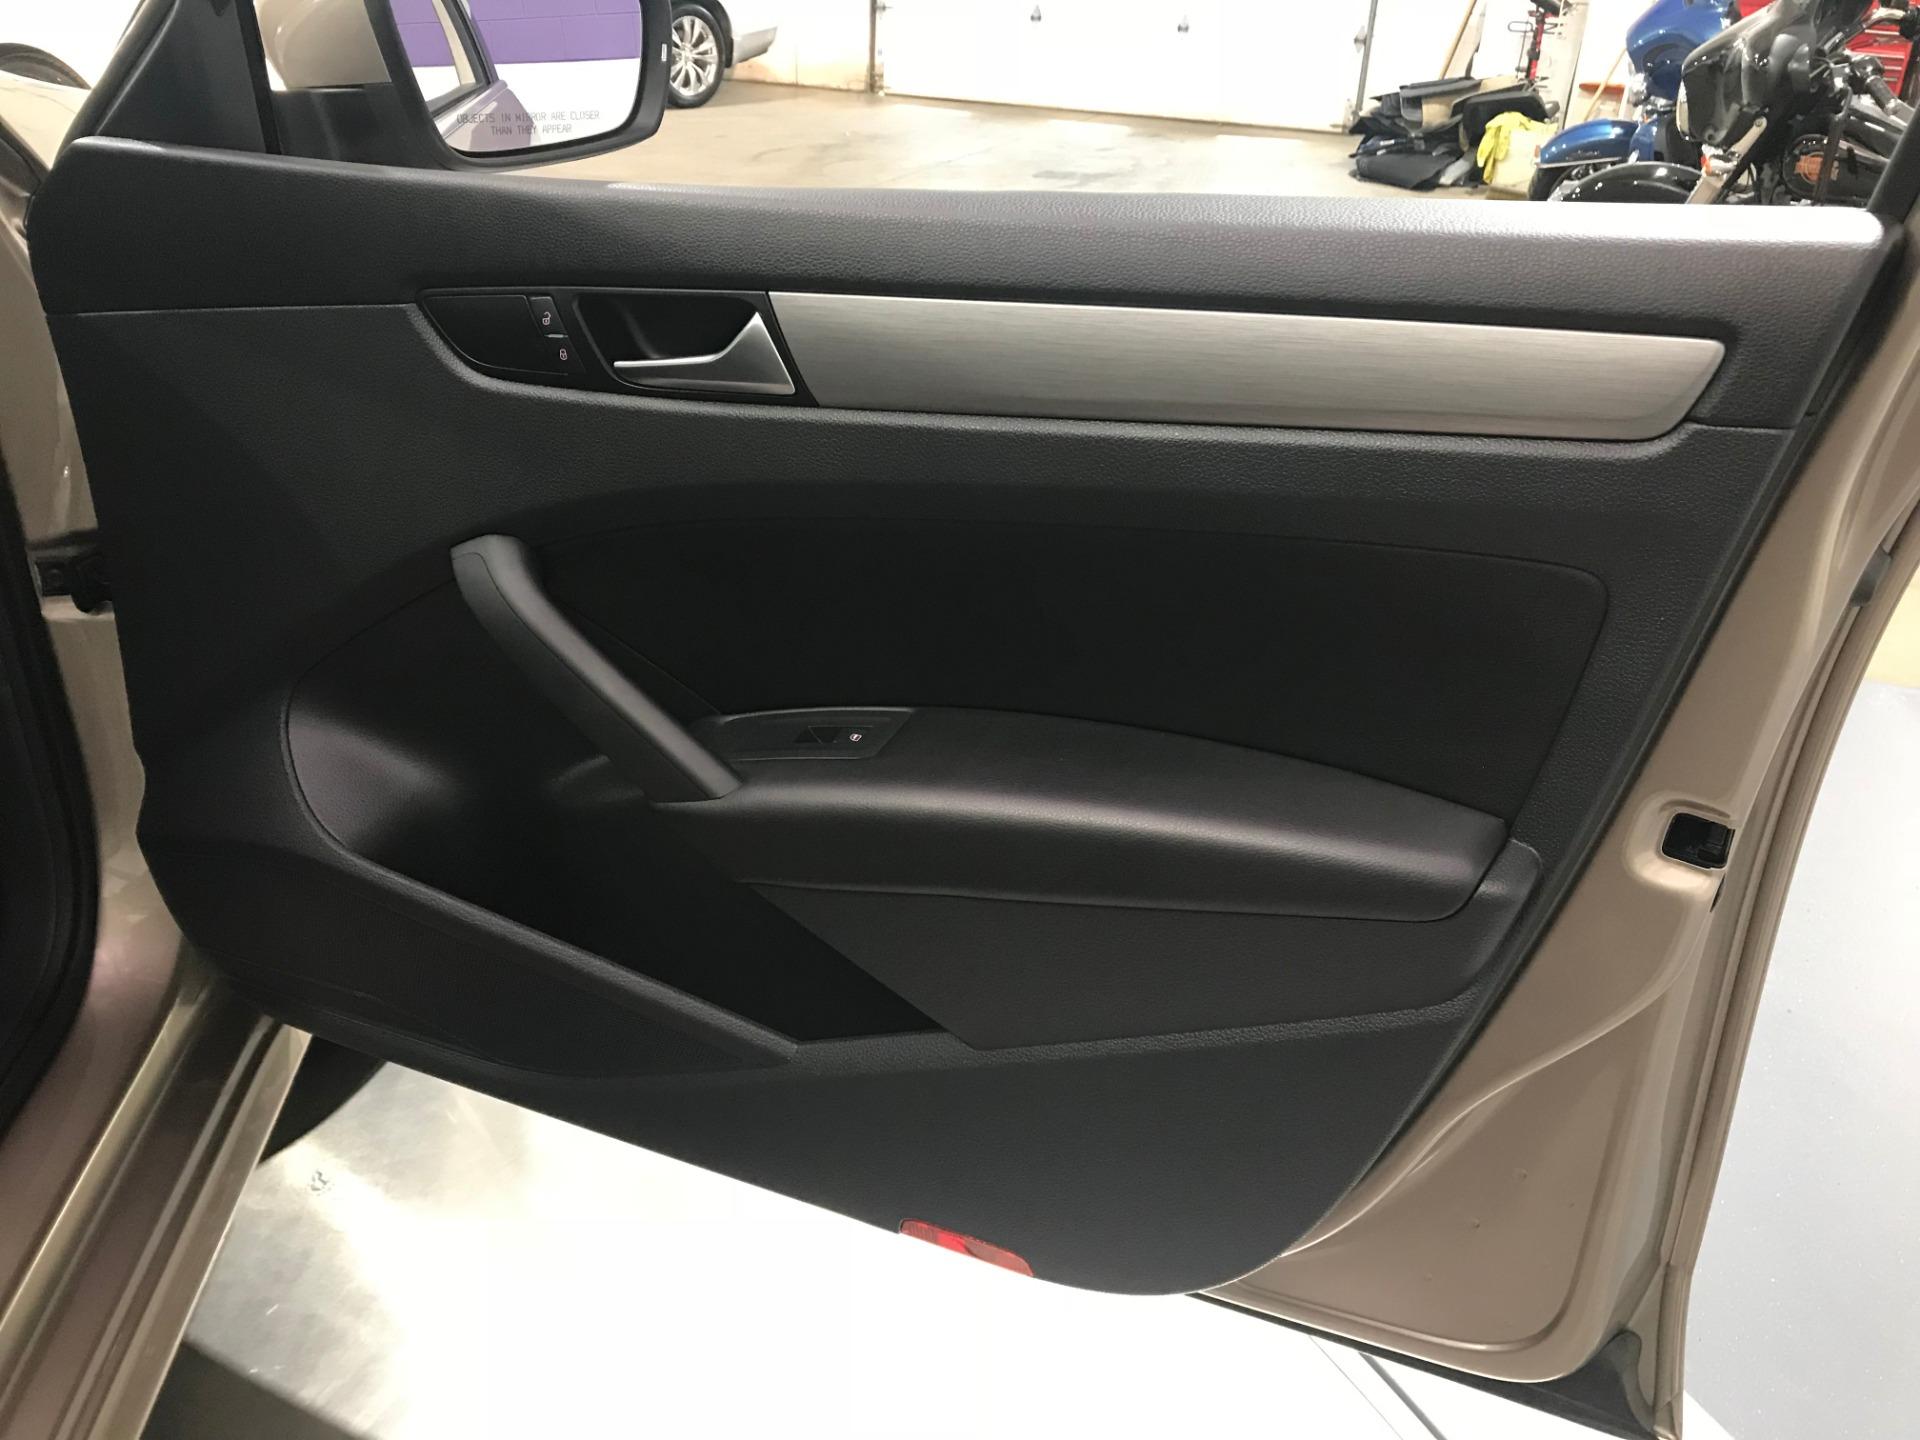 Used-2015-Volkswagen-Passat-TDI-SE-4dr-Sedan-6A-w/Sunroof